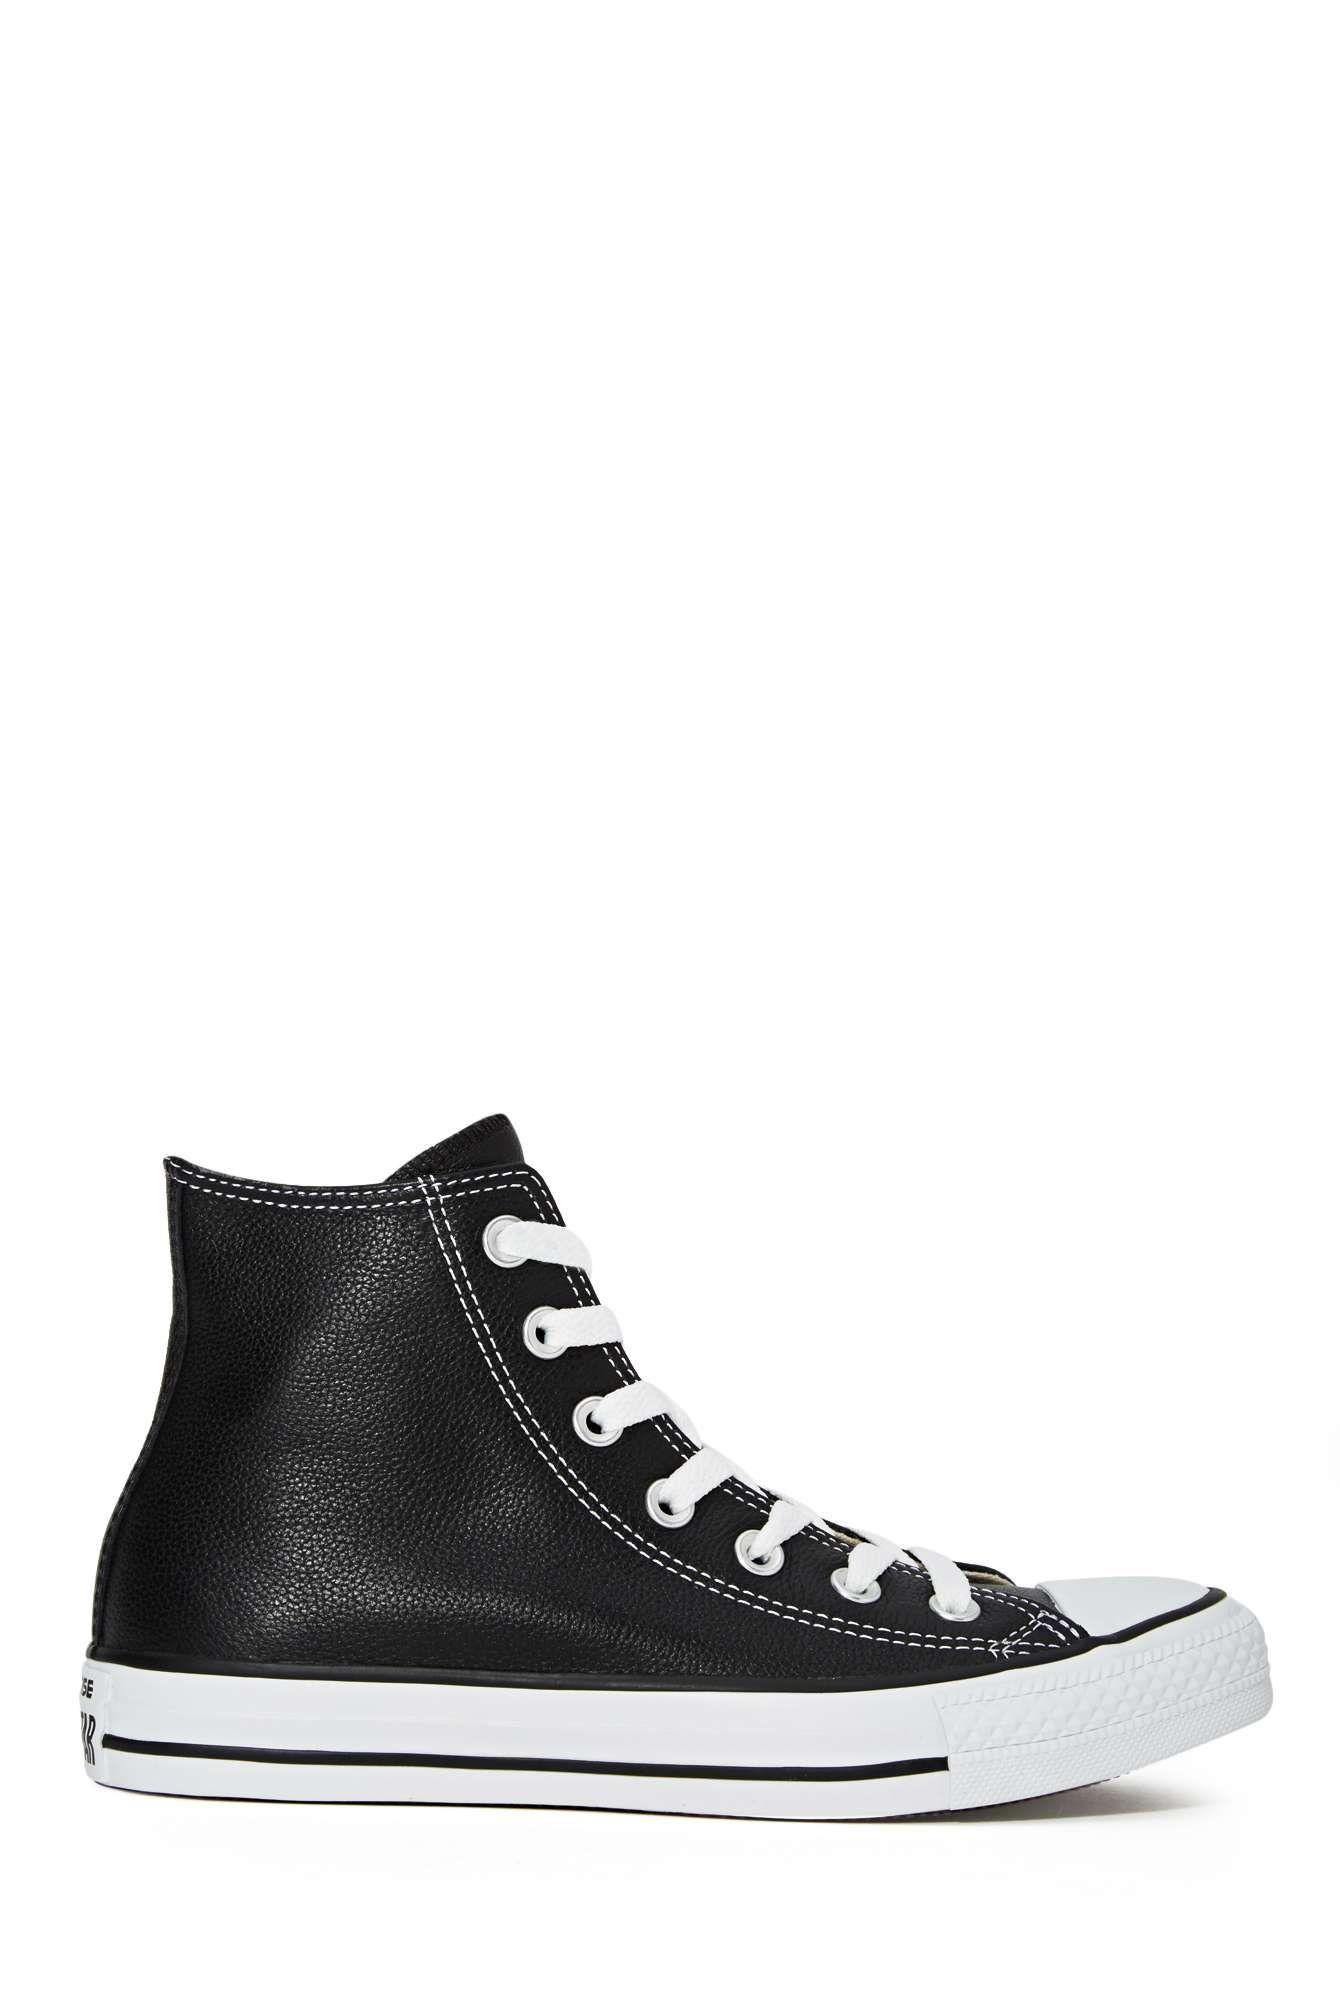 a39cde4ec5a Converse All Star High-Top Sneaker - Black Leather